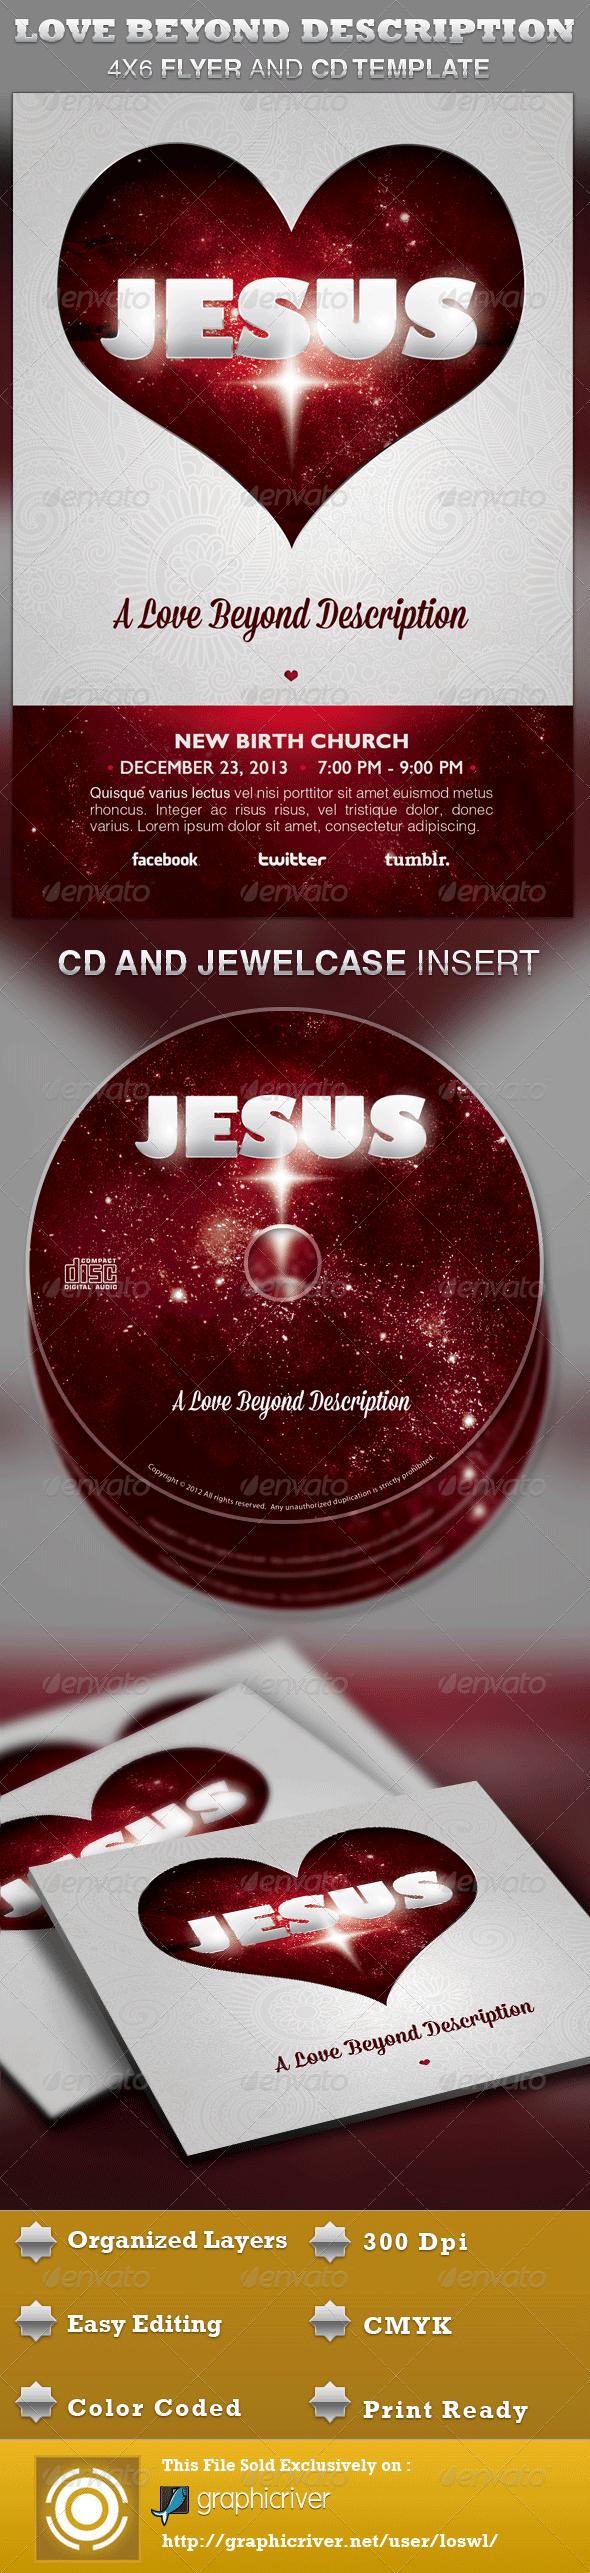 A Love Beyond Description Church Flyer and CD - Church Flyers